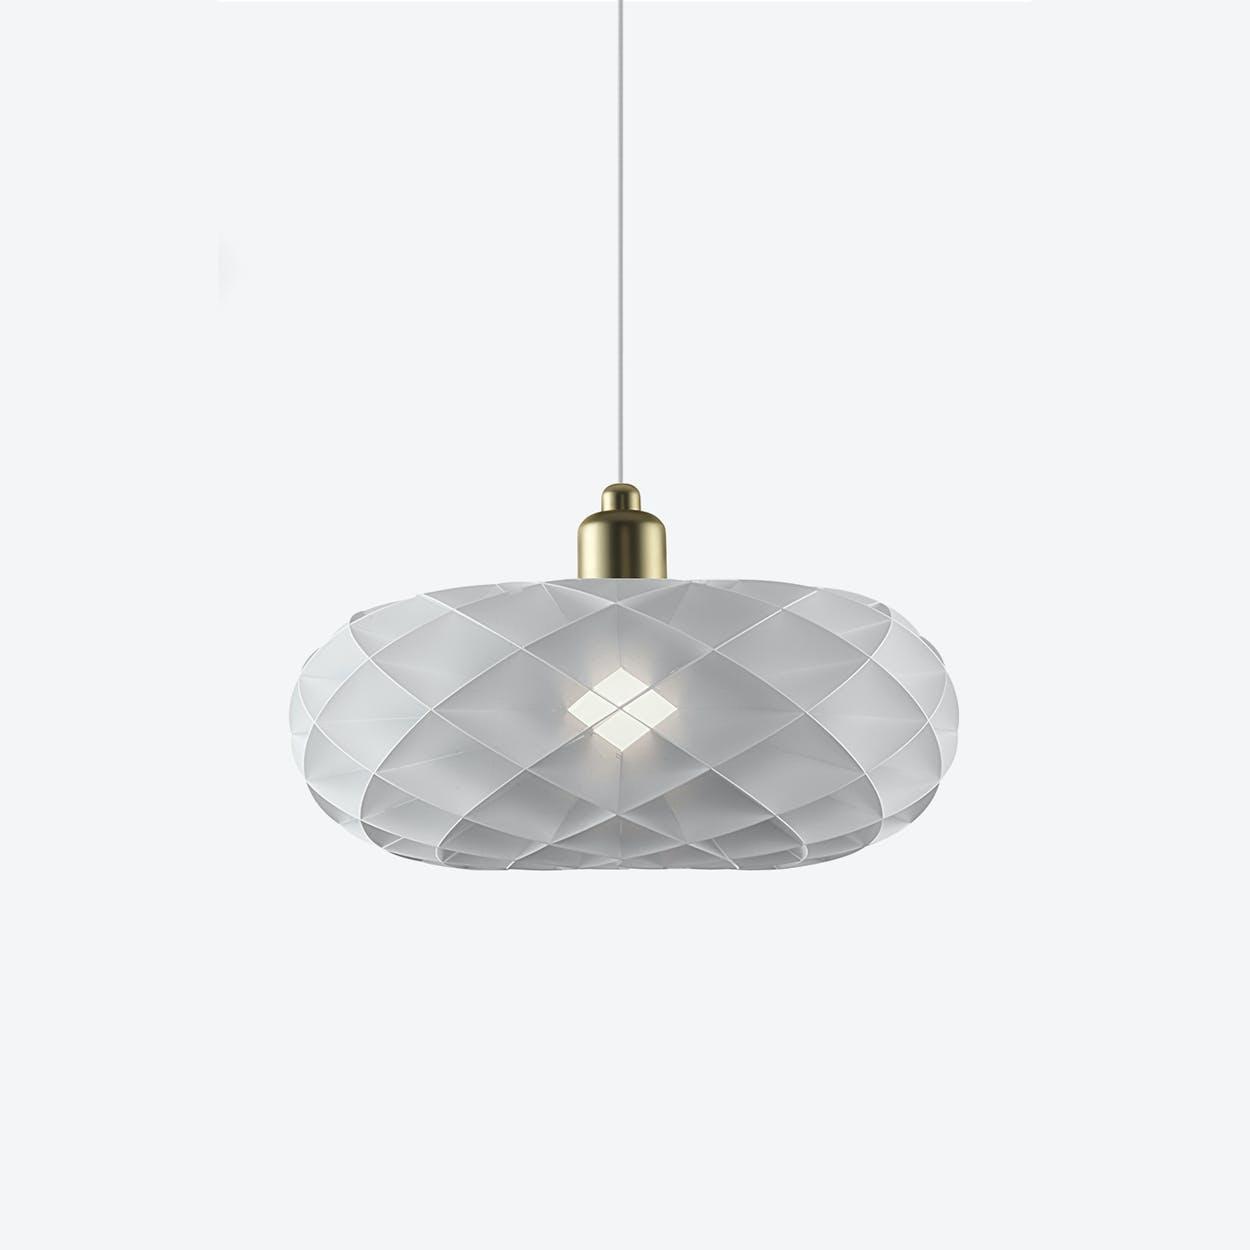 Torus Pendant Lamp with Matte Brass Top